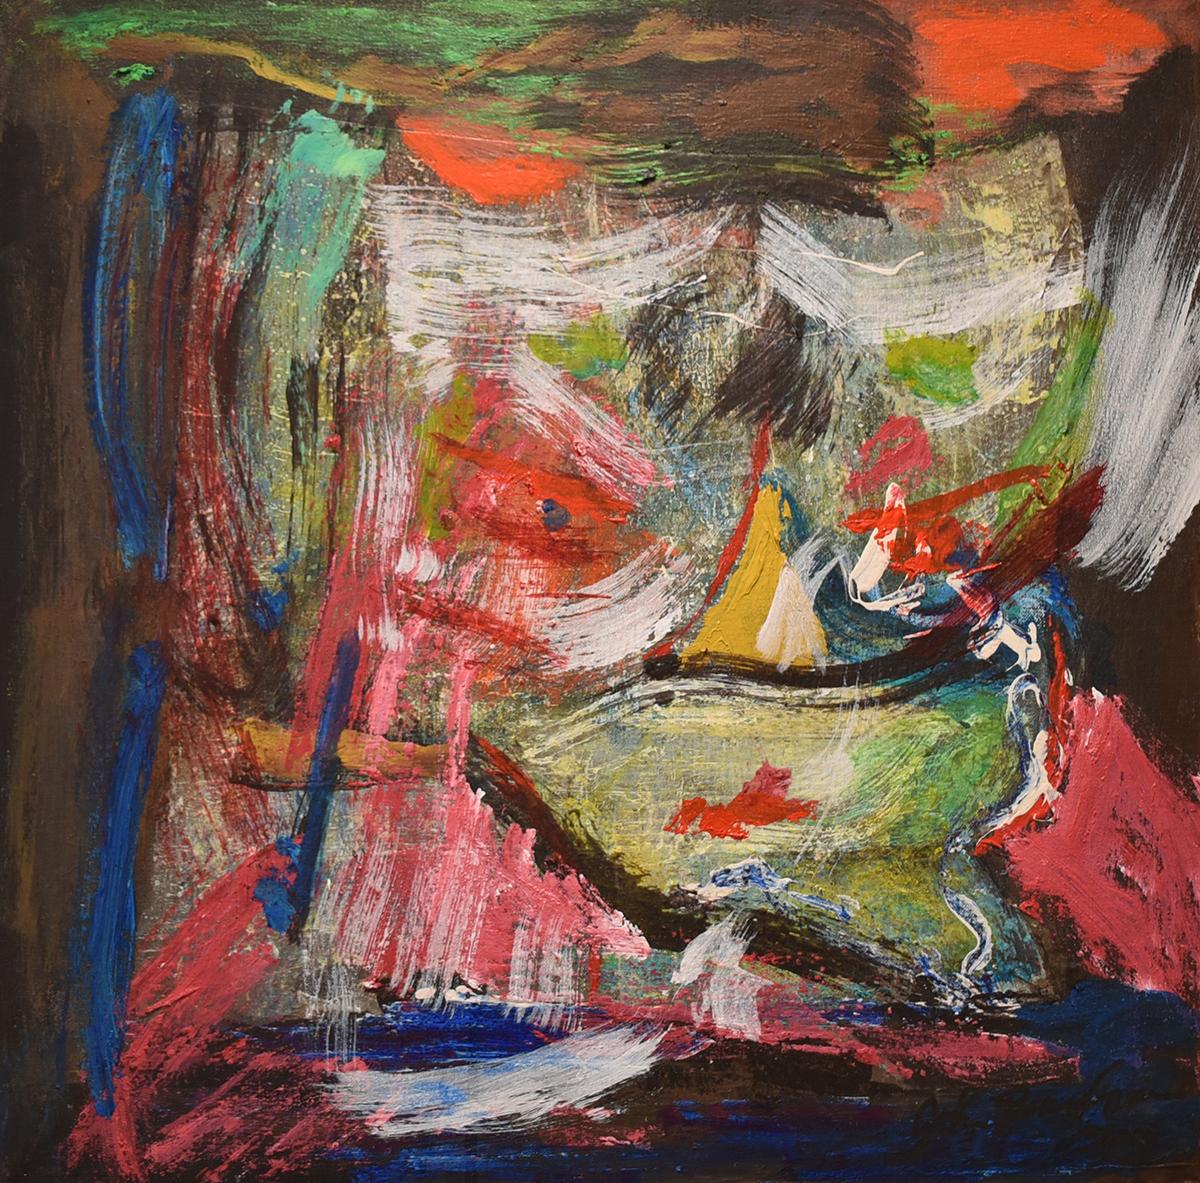 John Beardman, Fury, 2017, Mixed Media on Canvas, 19 x 19 inches, low res.jpg